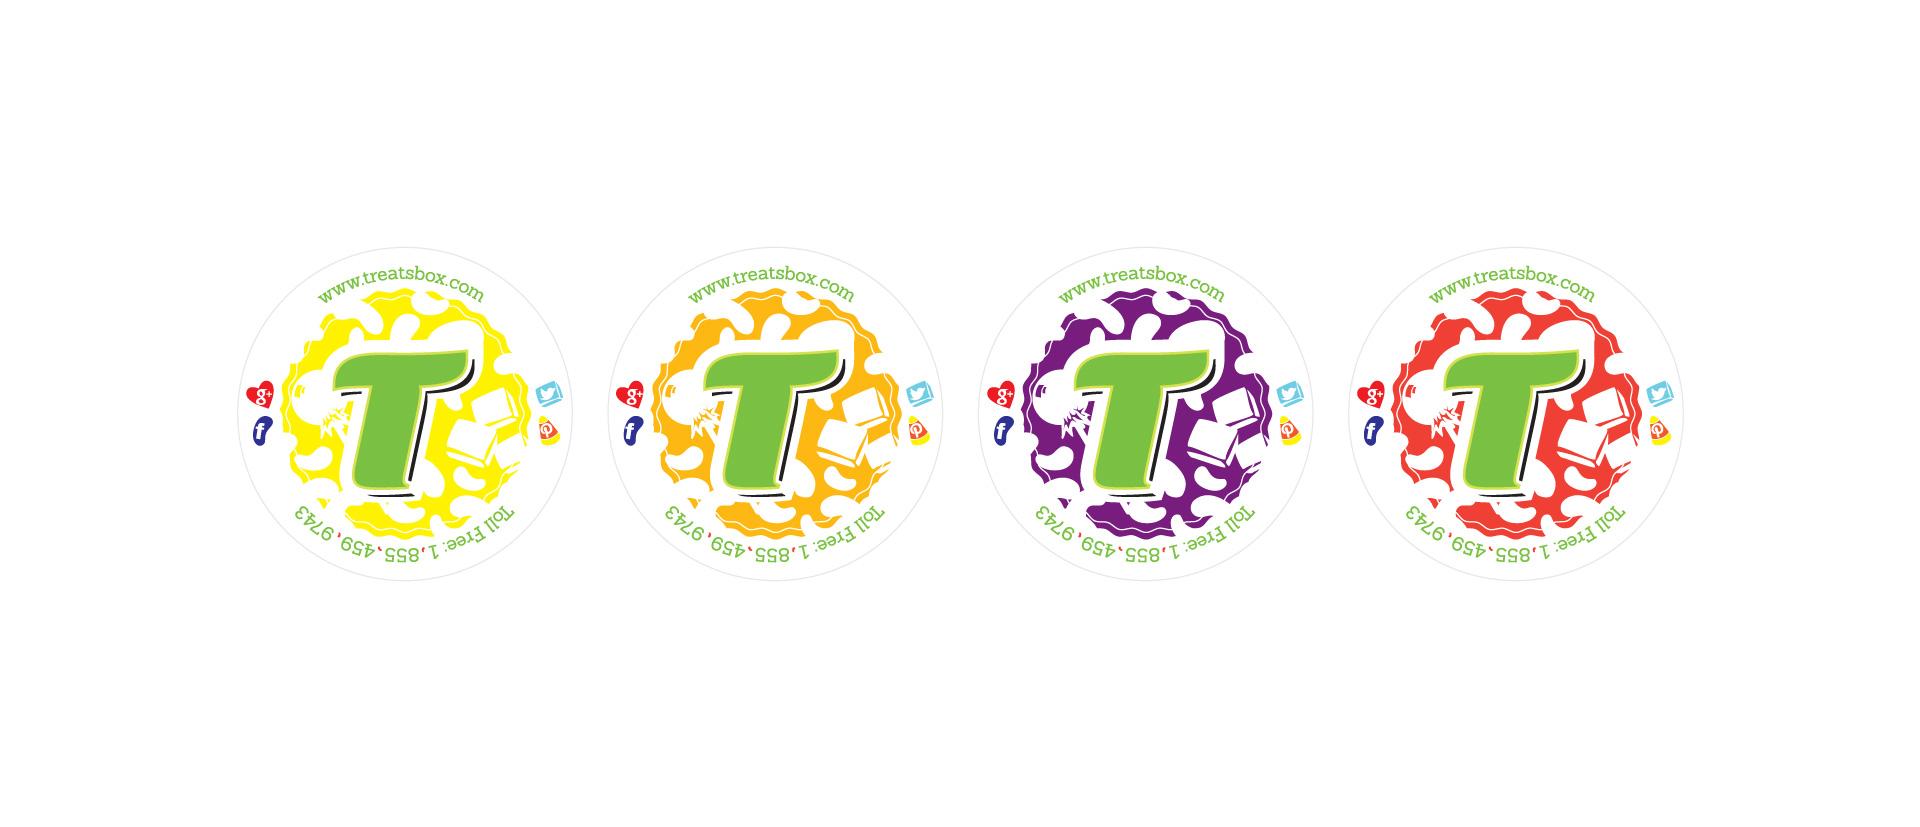 Treatsbox branding sticker design